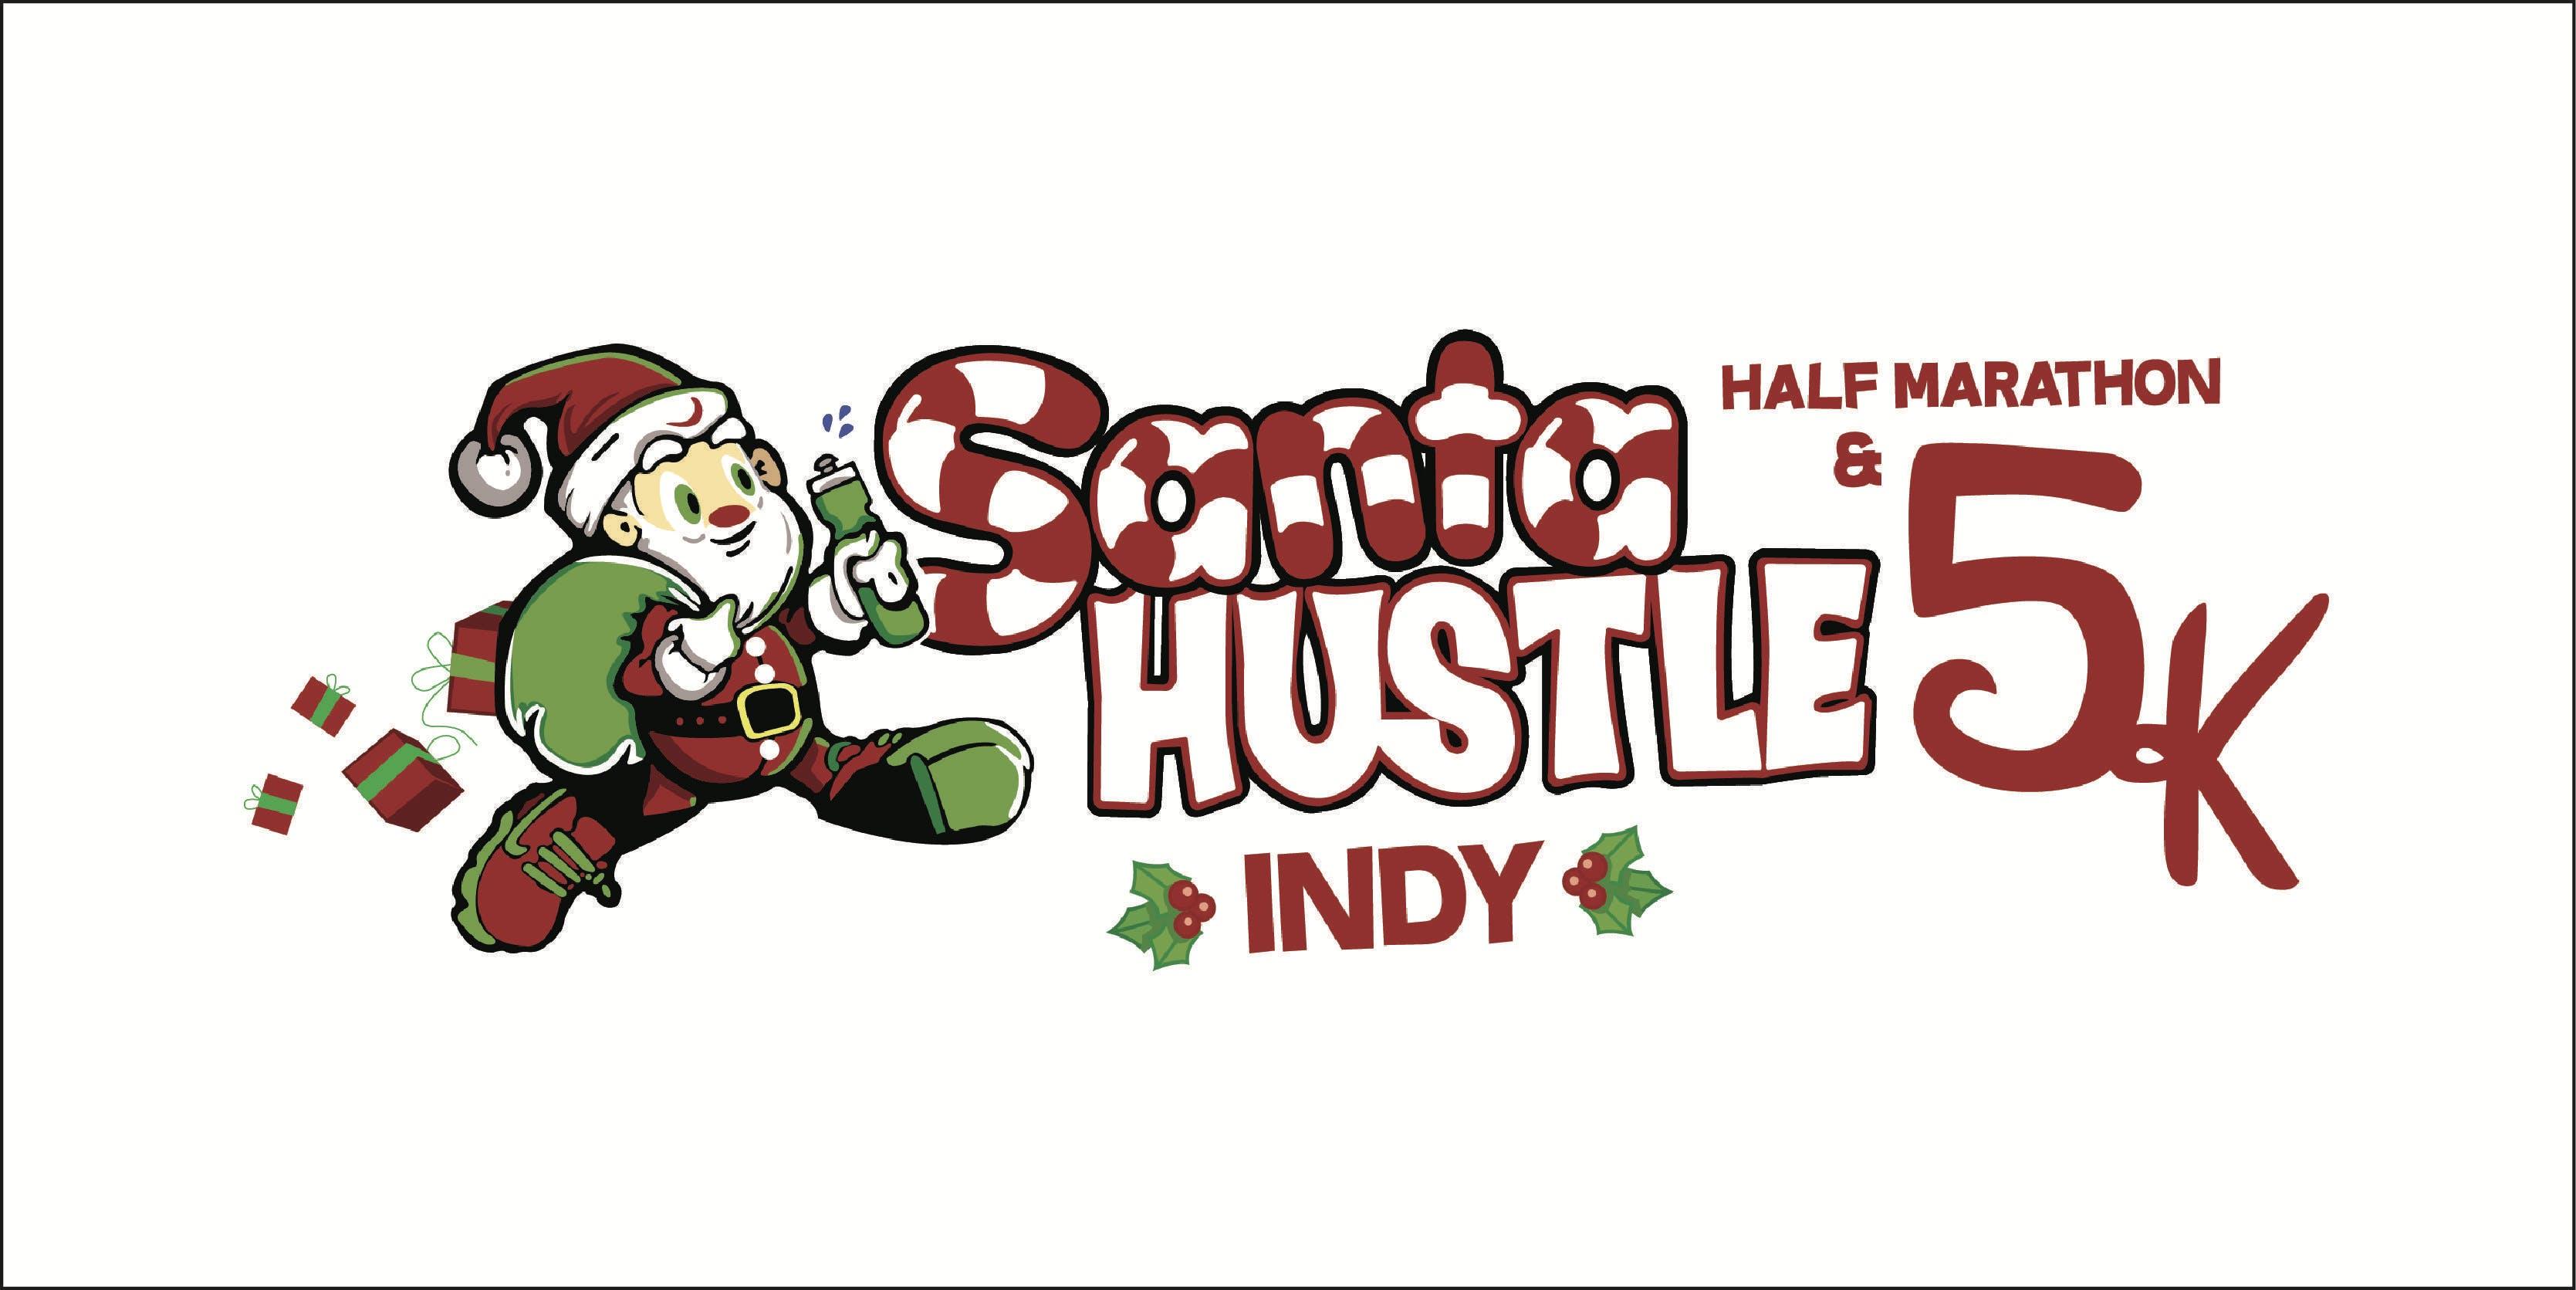 Santa Hustle Indy Half Marathon & 5K Volunteer Sign-up 2018 - 9 DEC 2018